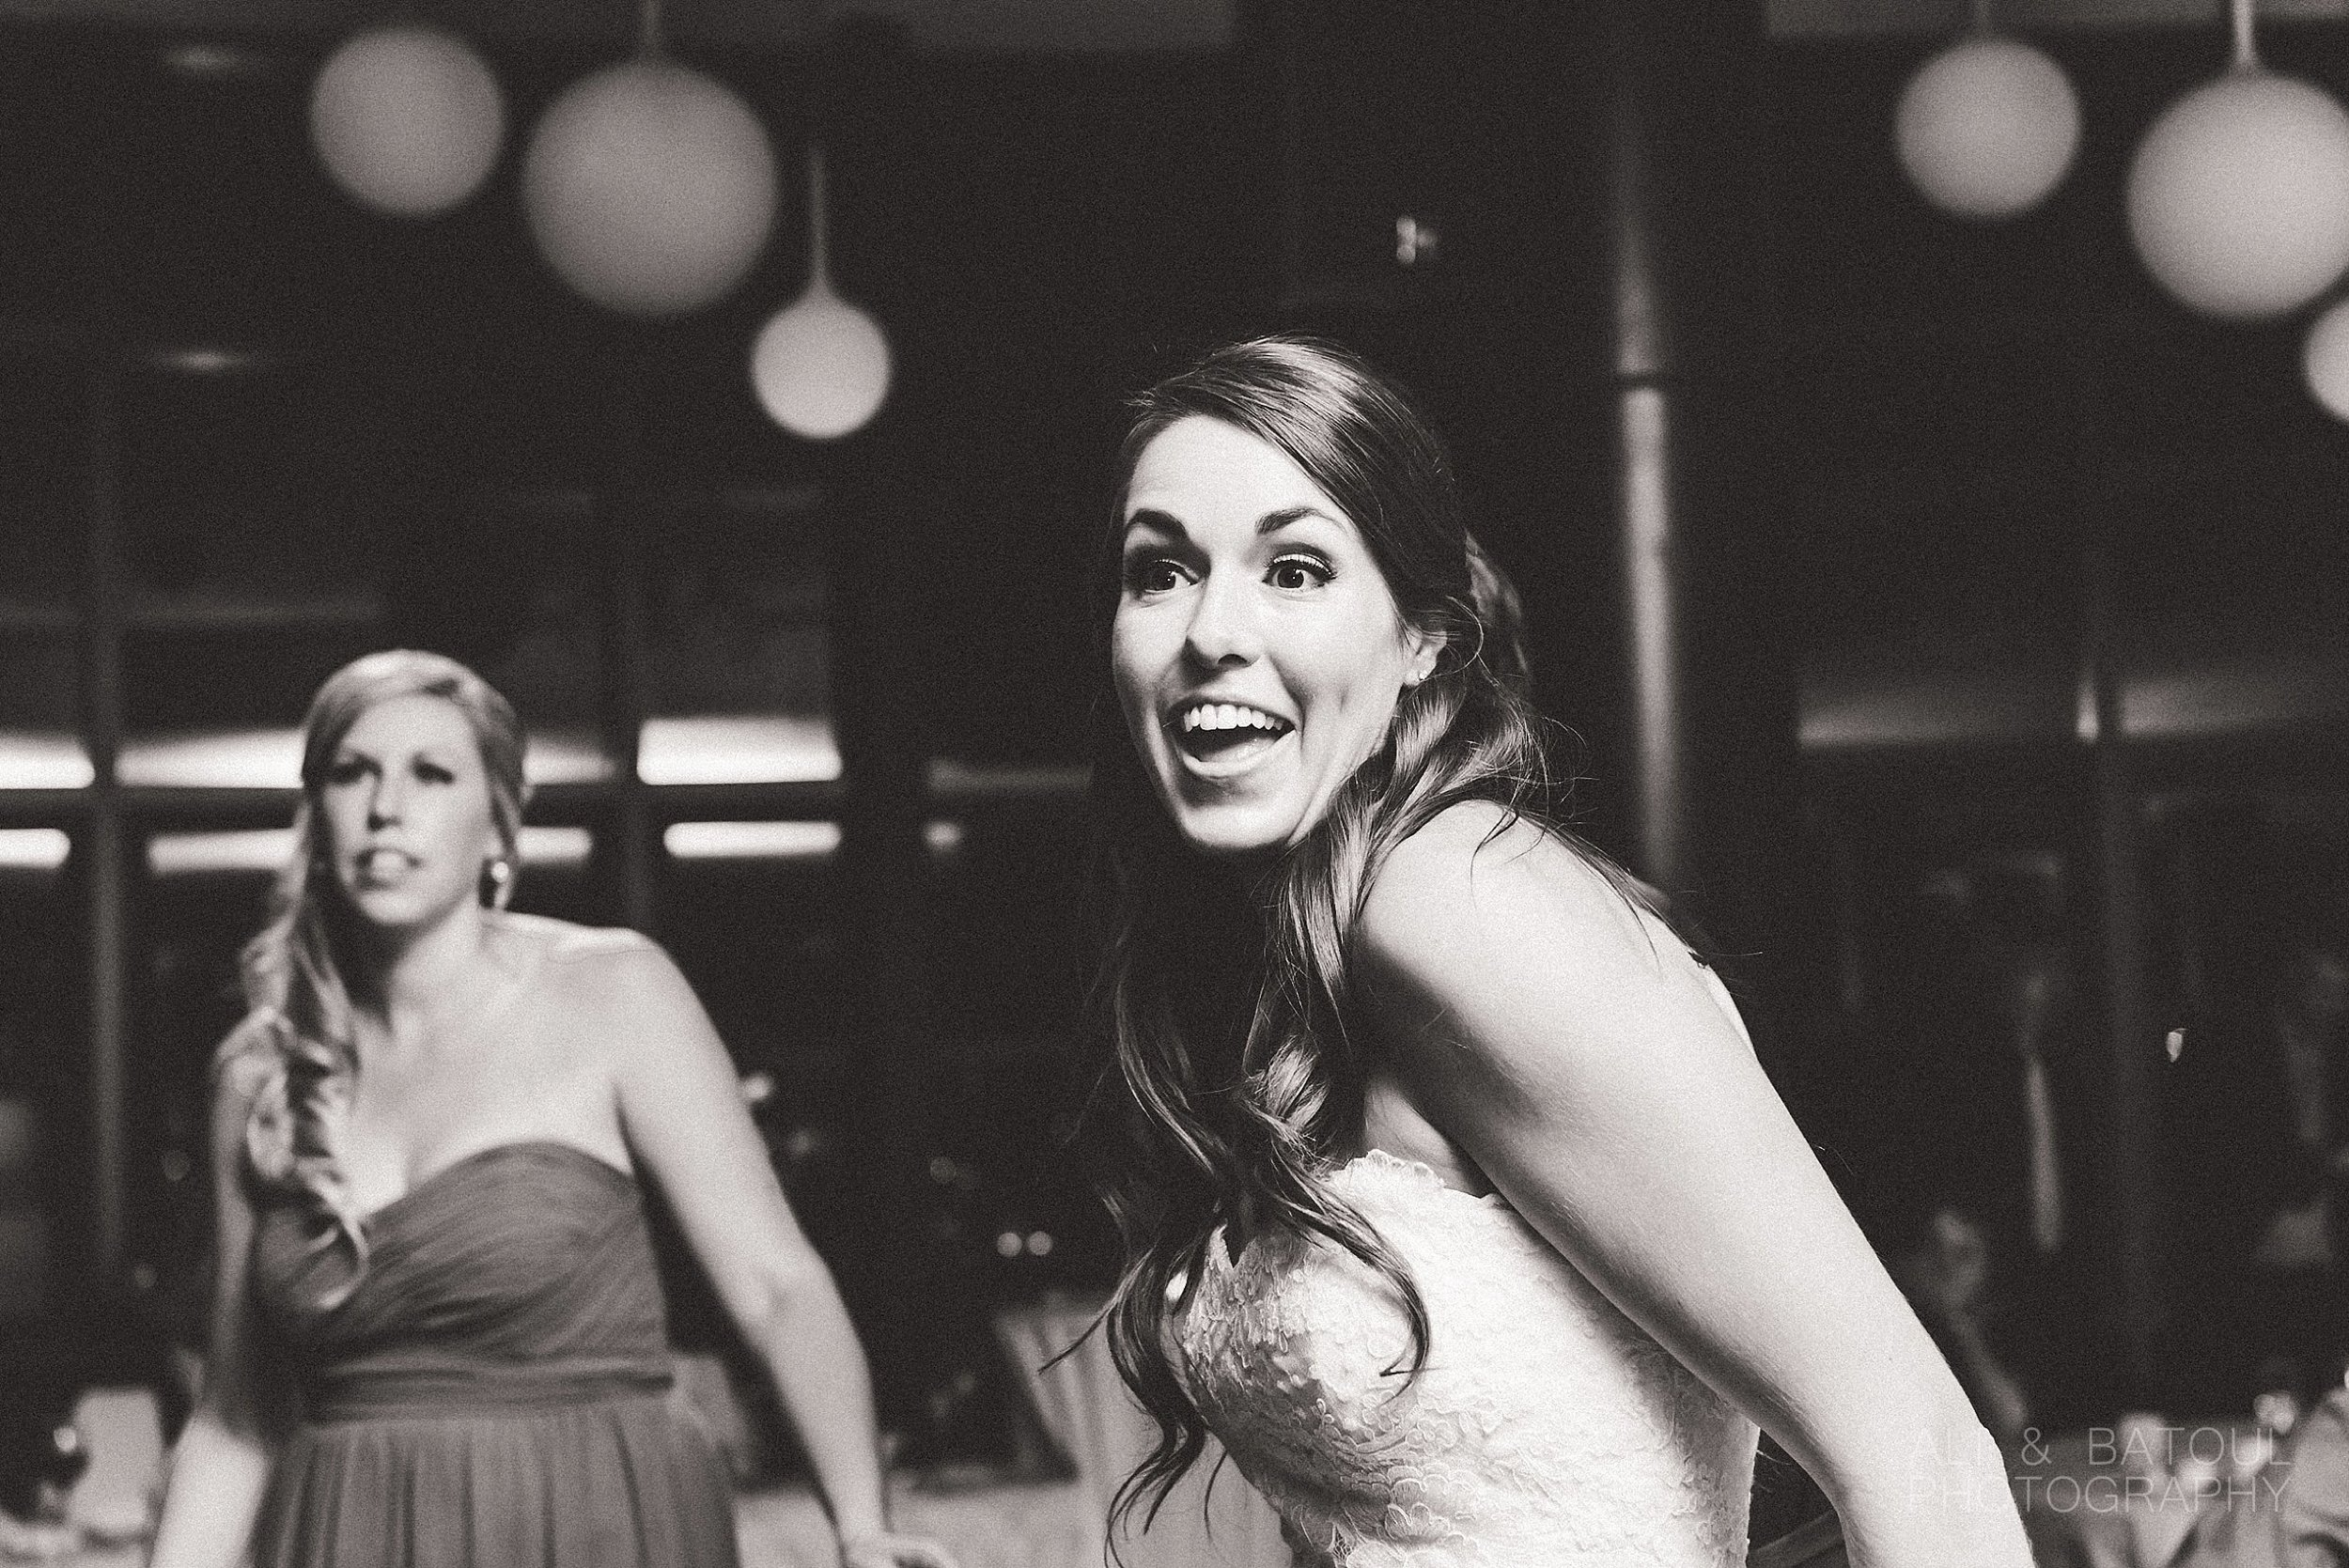 Ali & Batoul Photography - Documentary Fine Art Ottawa Wedding Photography_0097.jpg